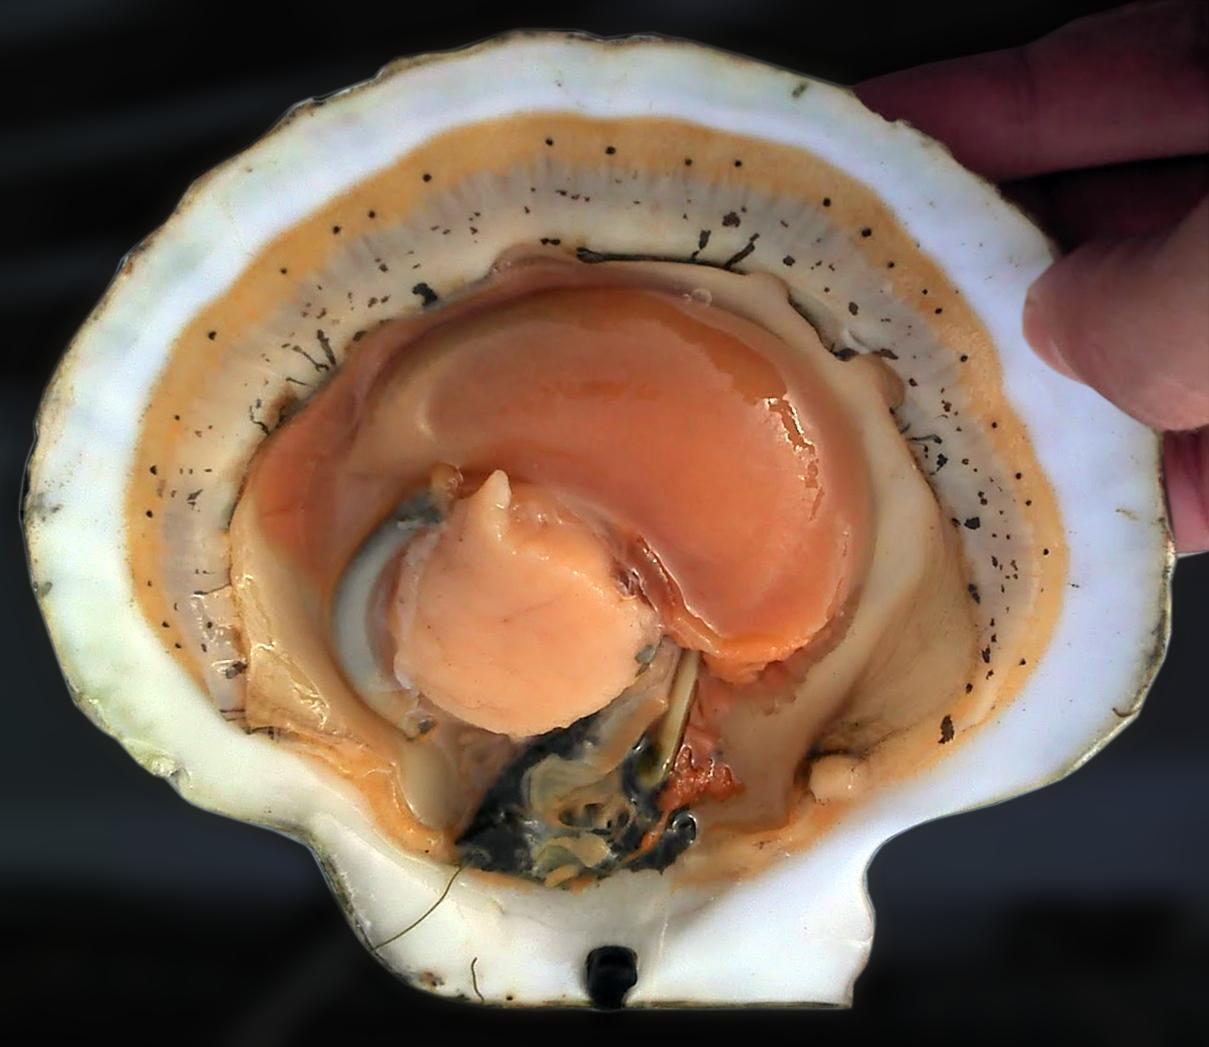 Anatomy of scallop